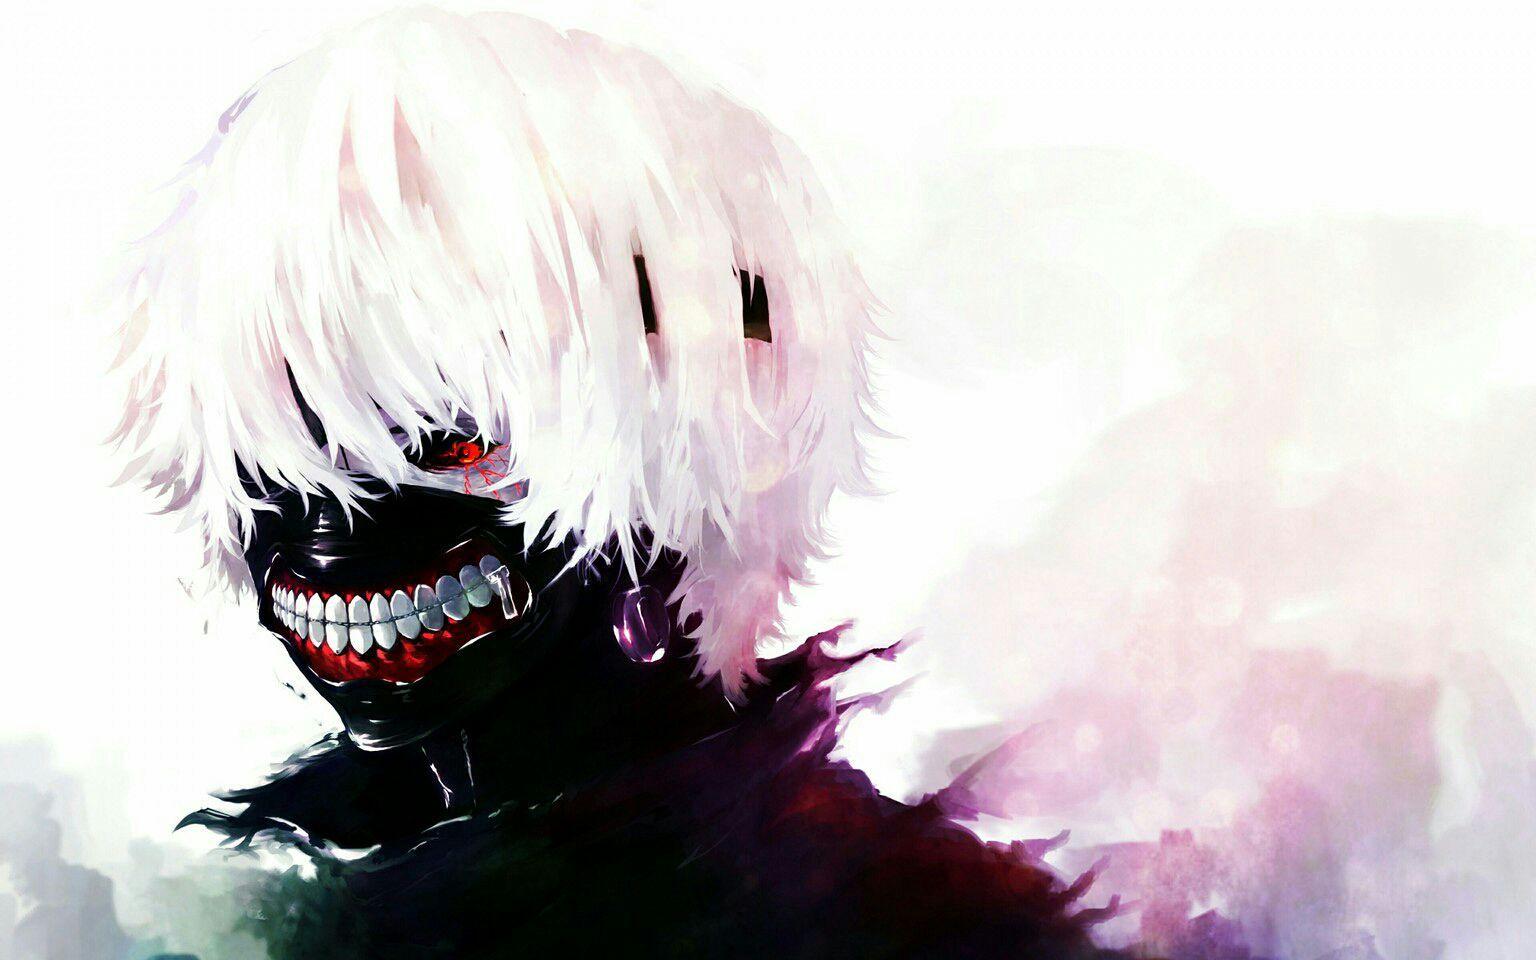 Memy Z Anime Tokyo Ghoul Wallpapers 4k Anime Wallpaper Tokyo Ghoul Anime